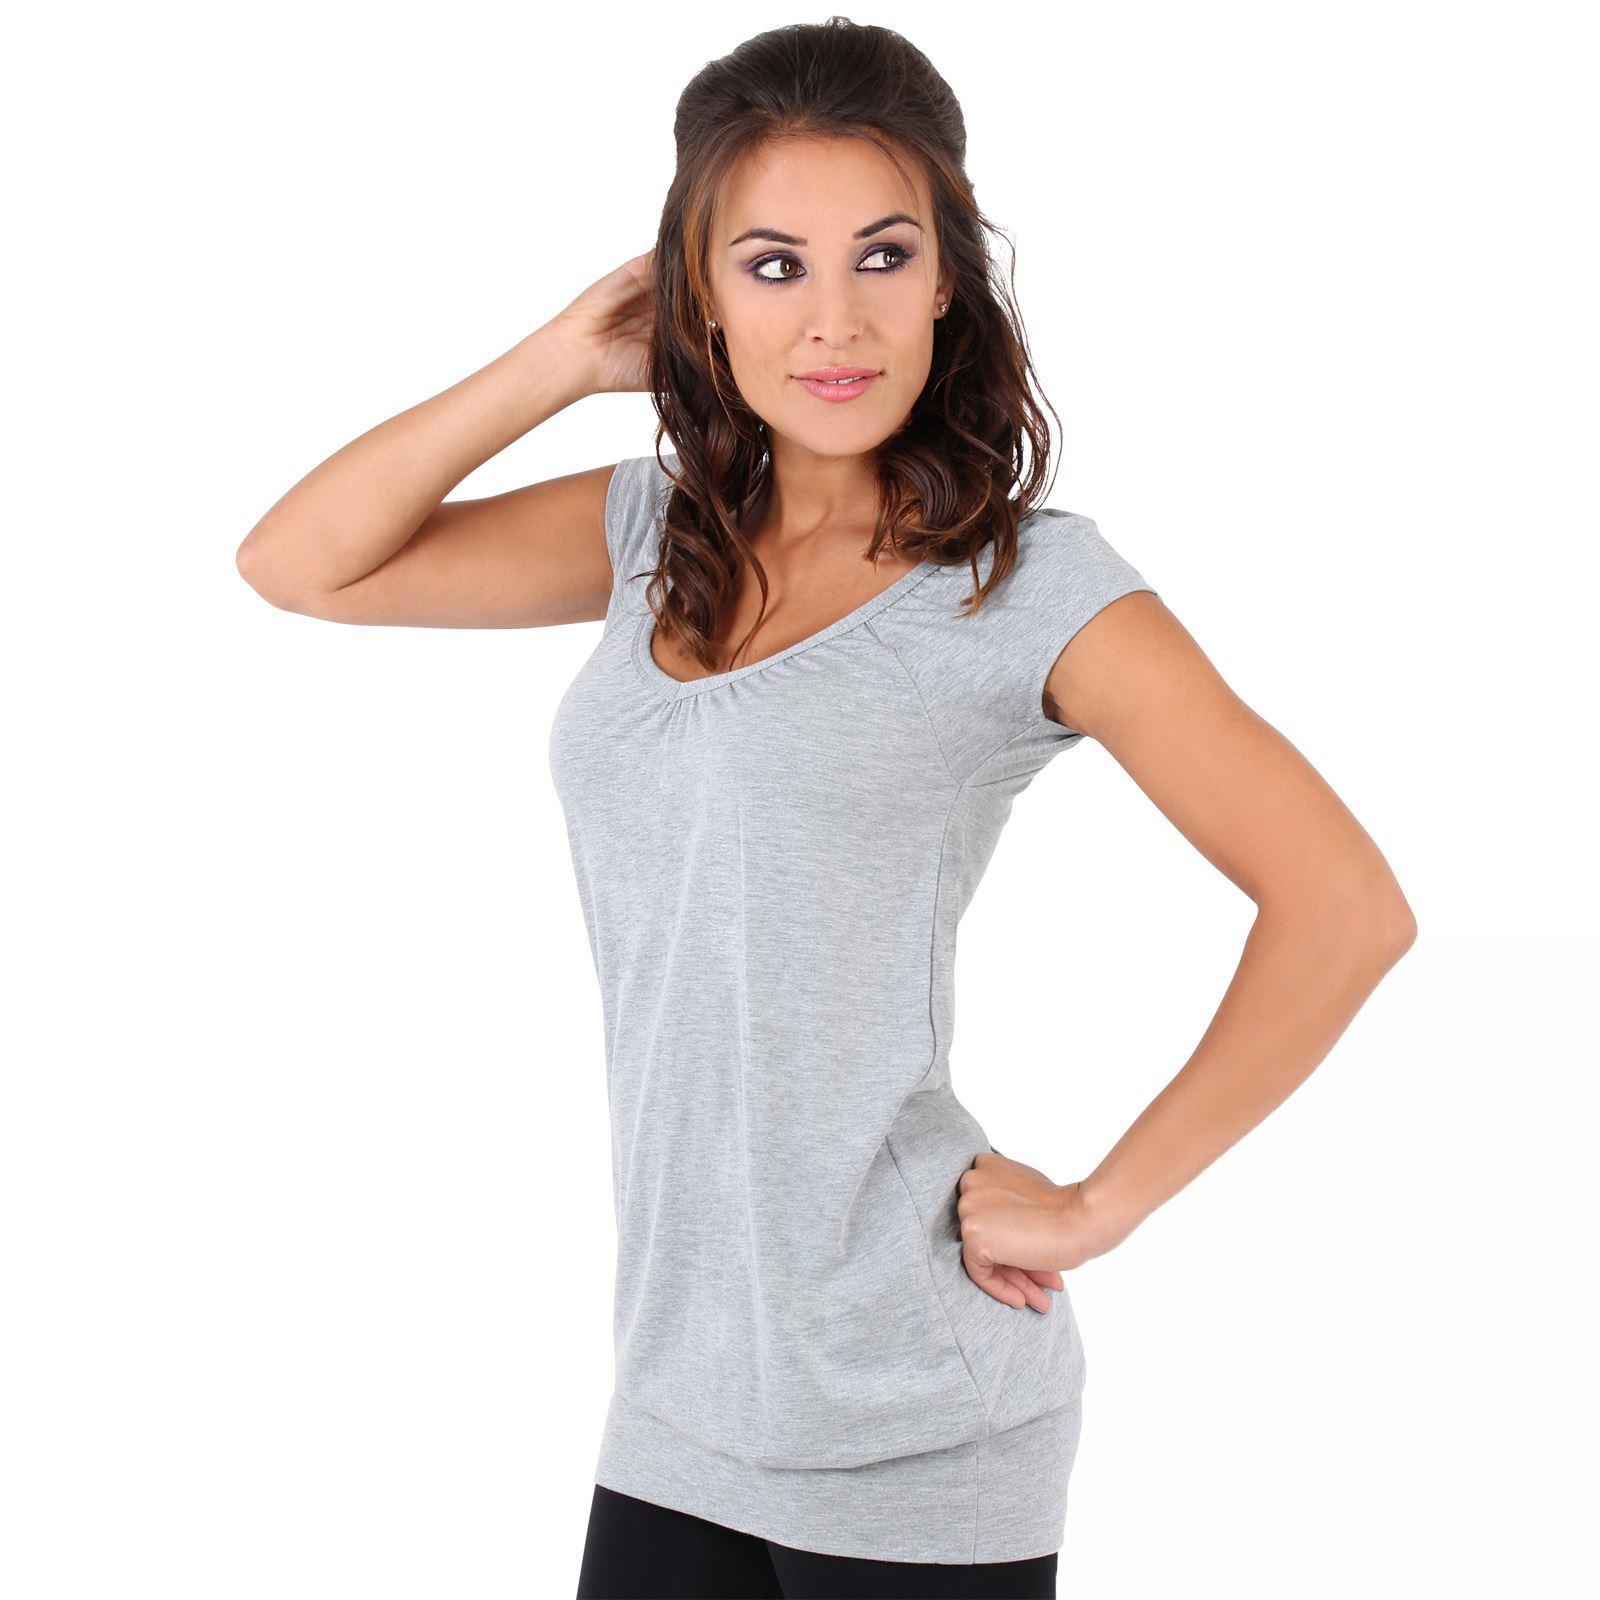 Womens-Ladies-Plain-T-Shirt-Short-Sleeve-Long-Loose-V-Neck-Blouse-Tunic-Top thumbnail 21